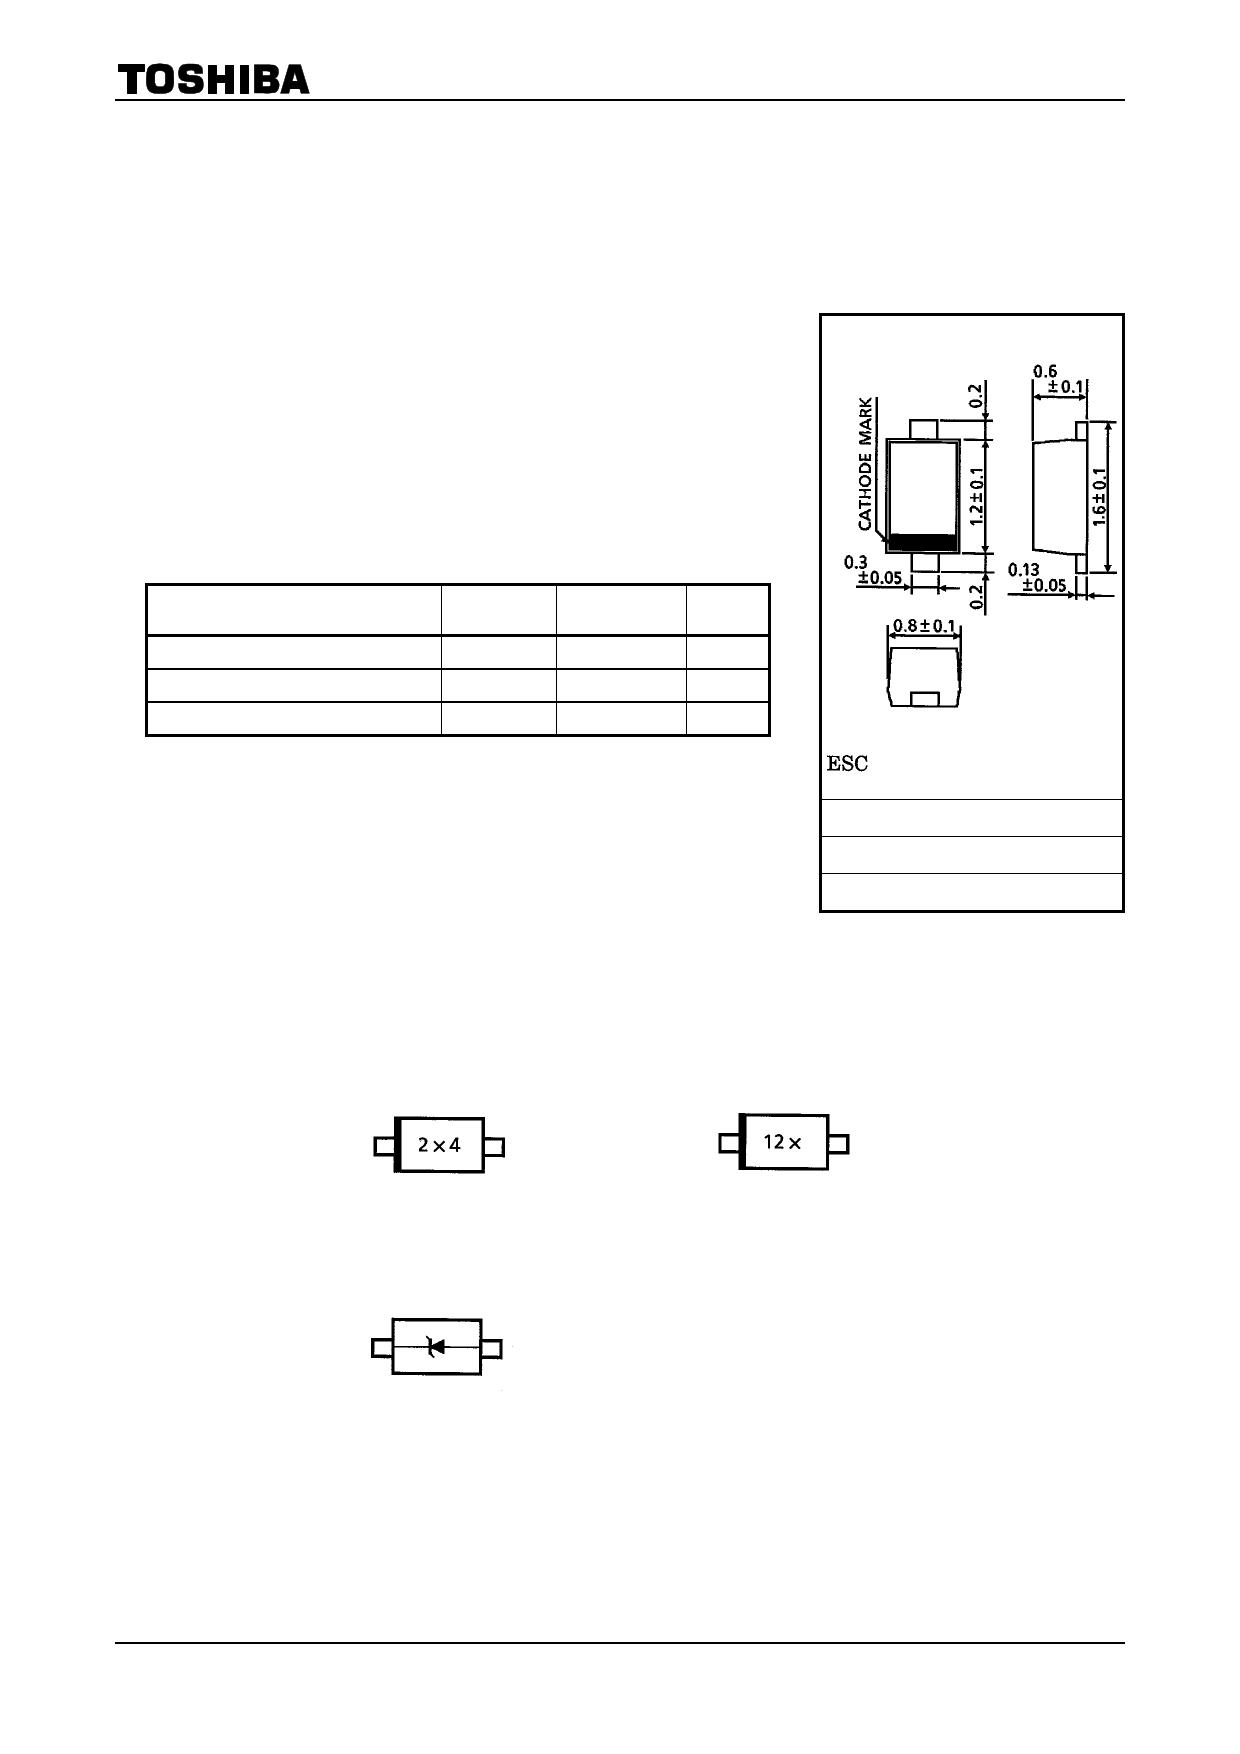 015AZ4.3 datasheet